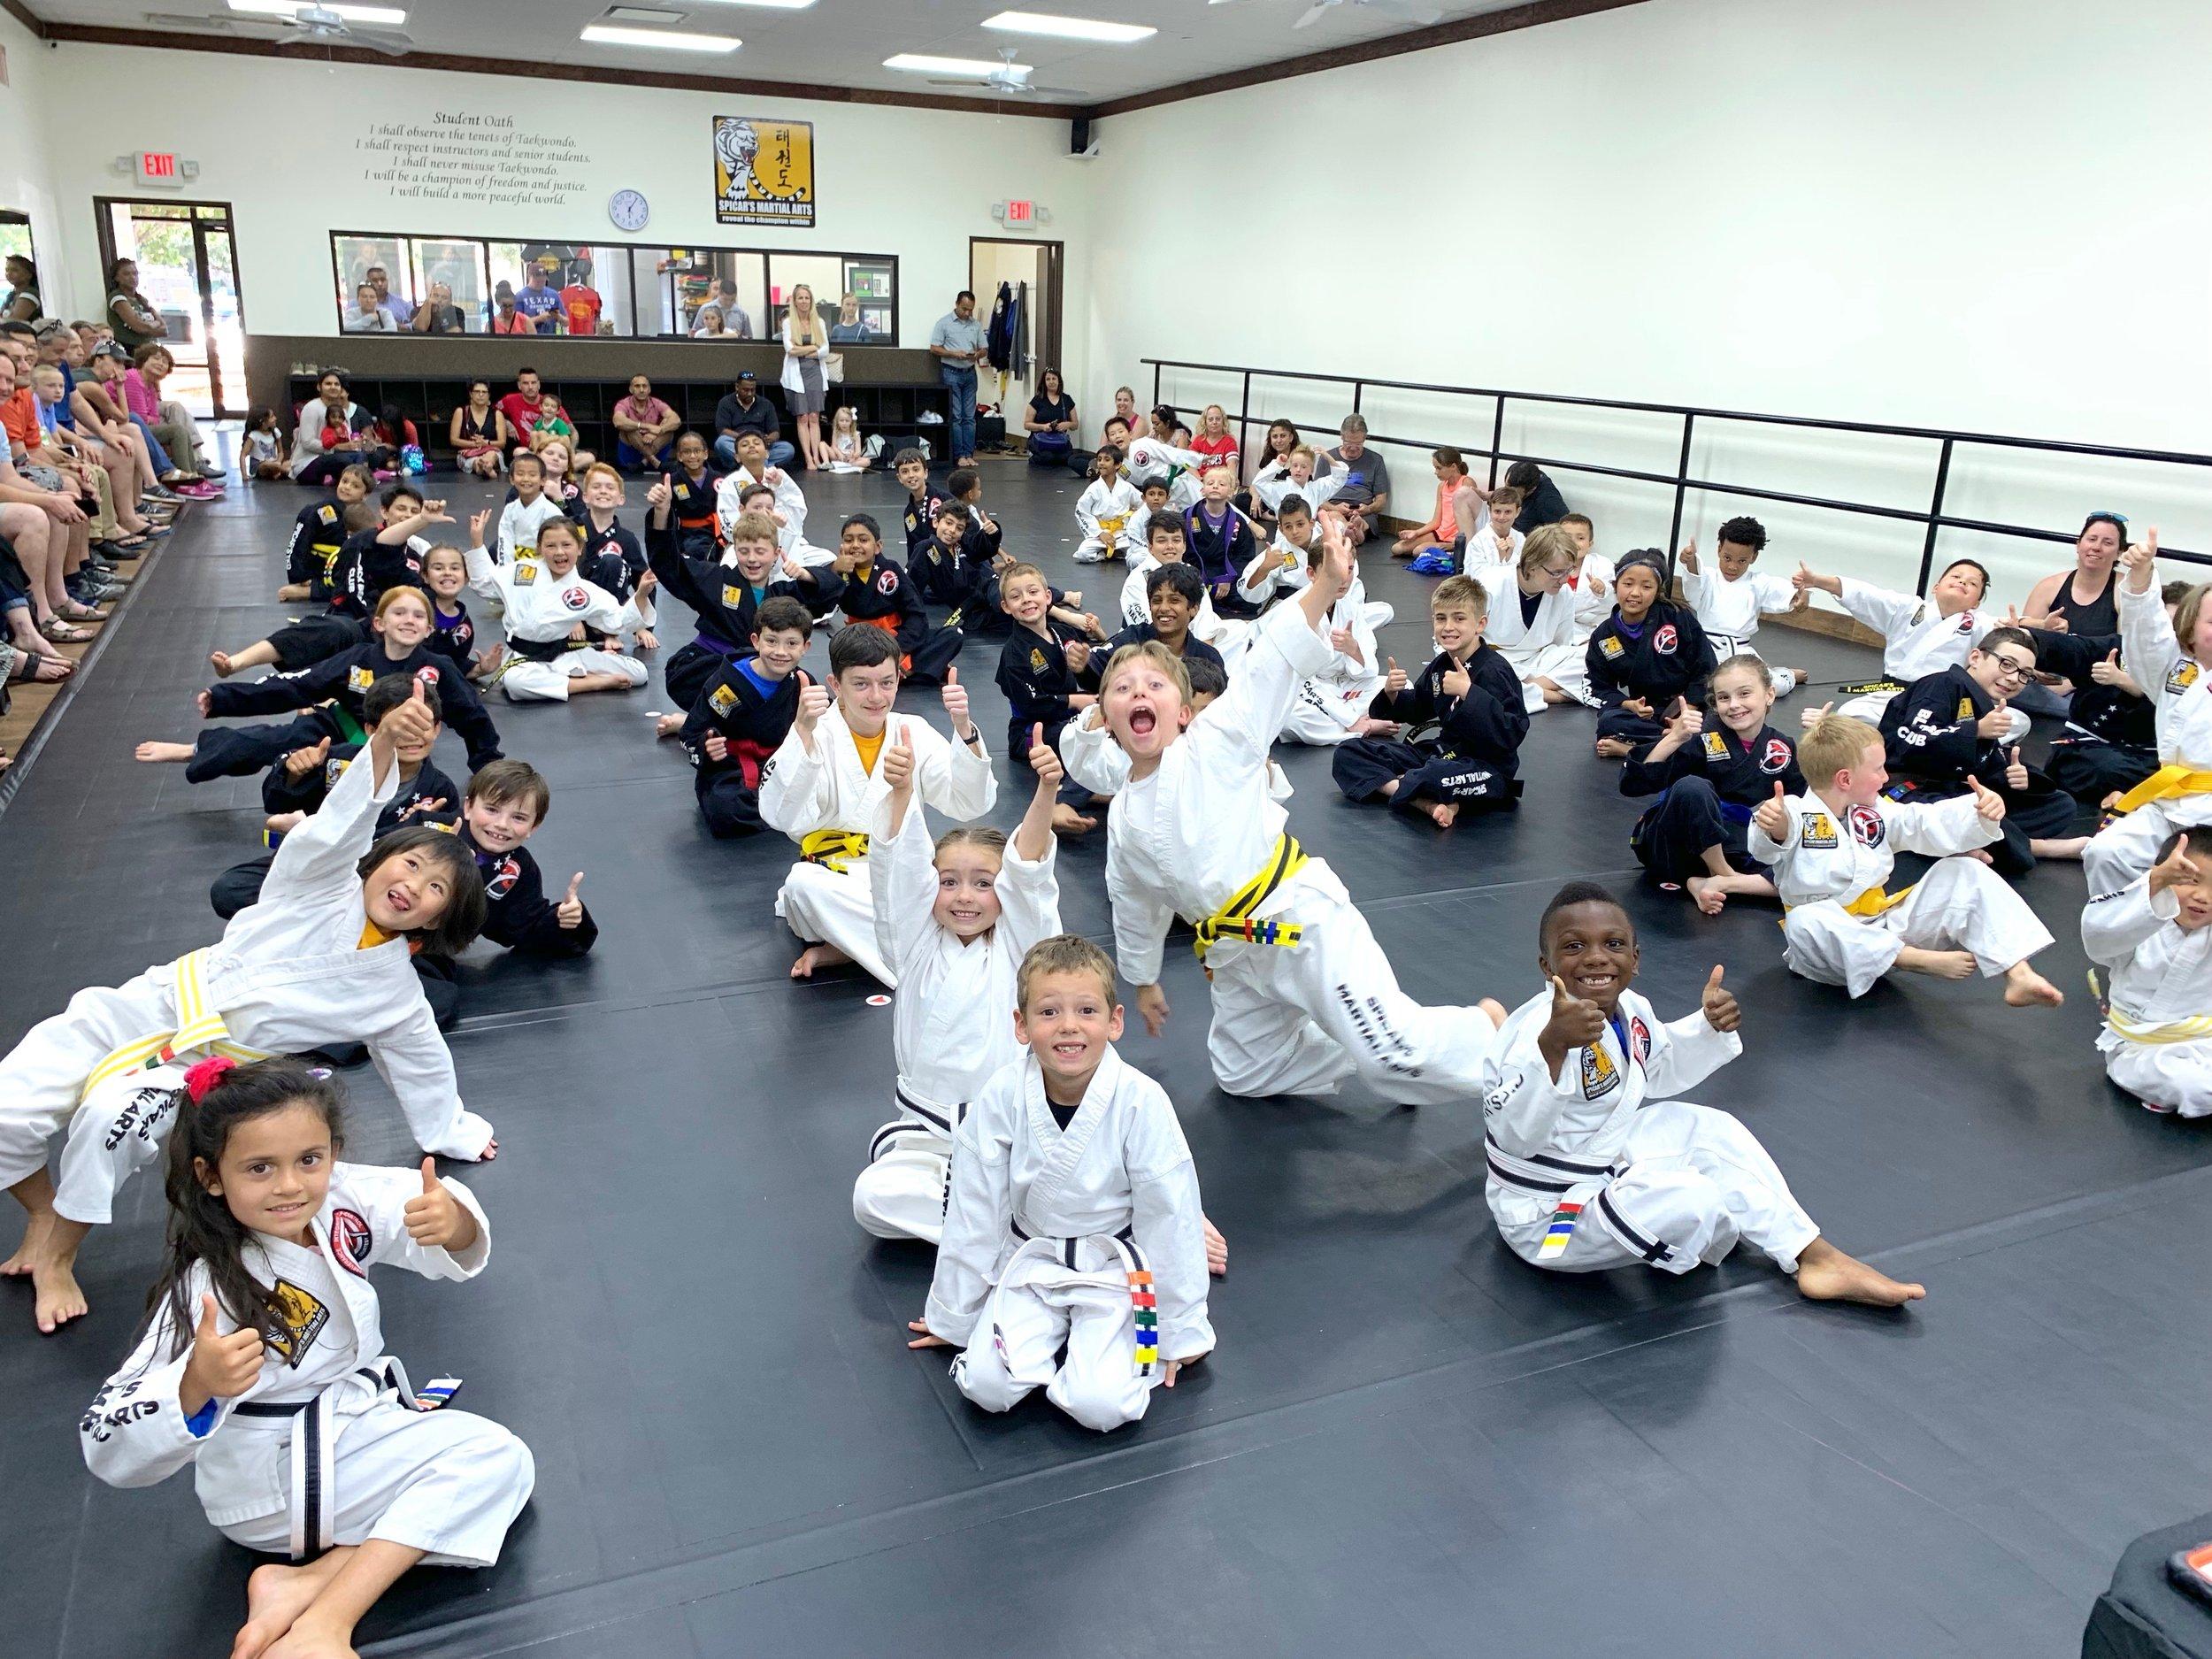 karate-kids-program-souhtlake-keller-grapevine-texas00062.jpeg